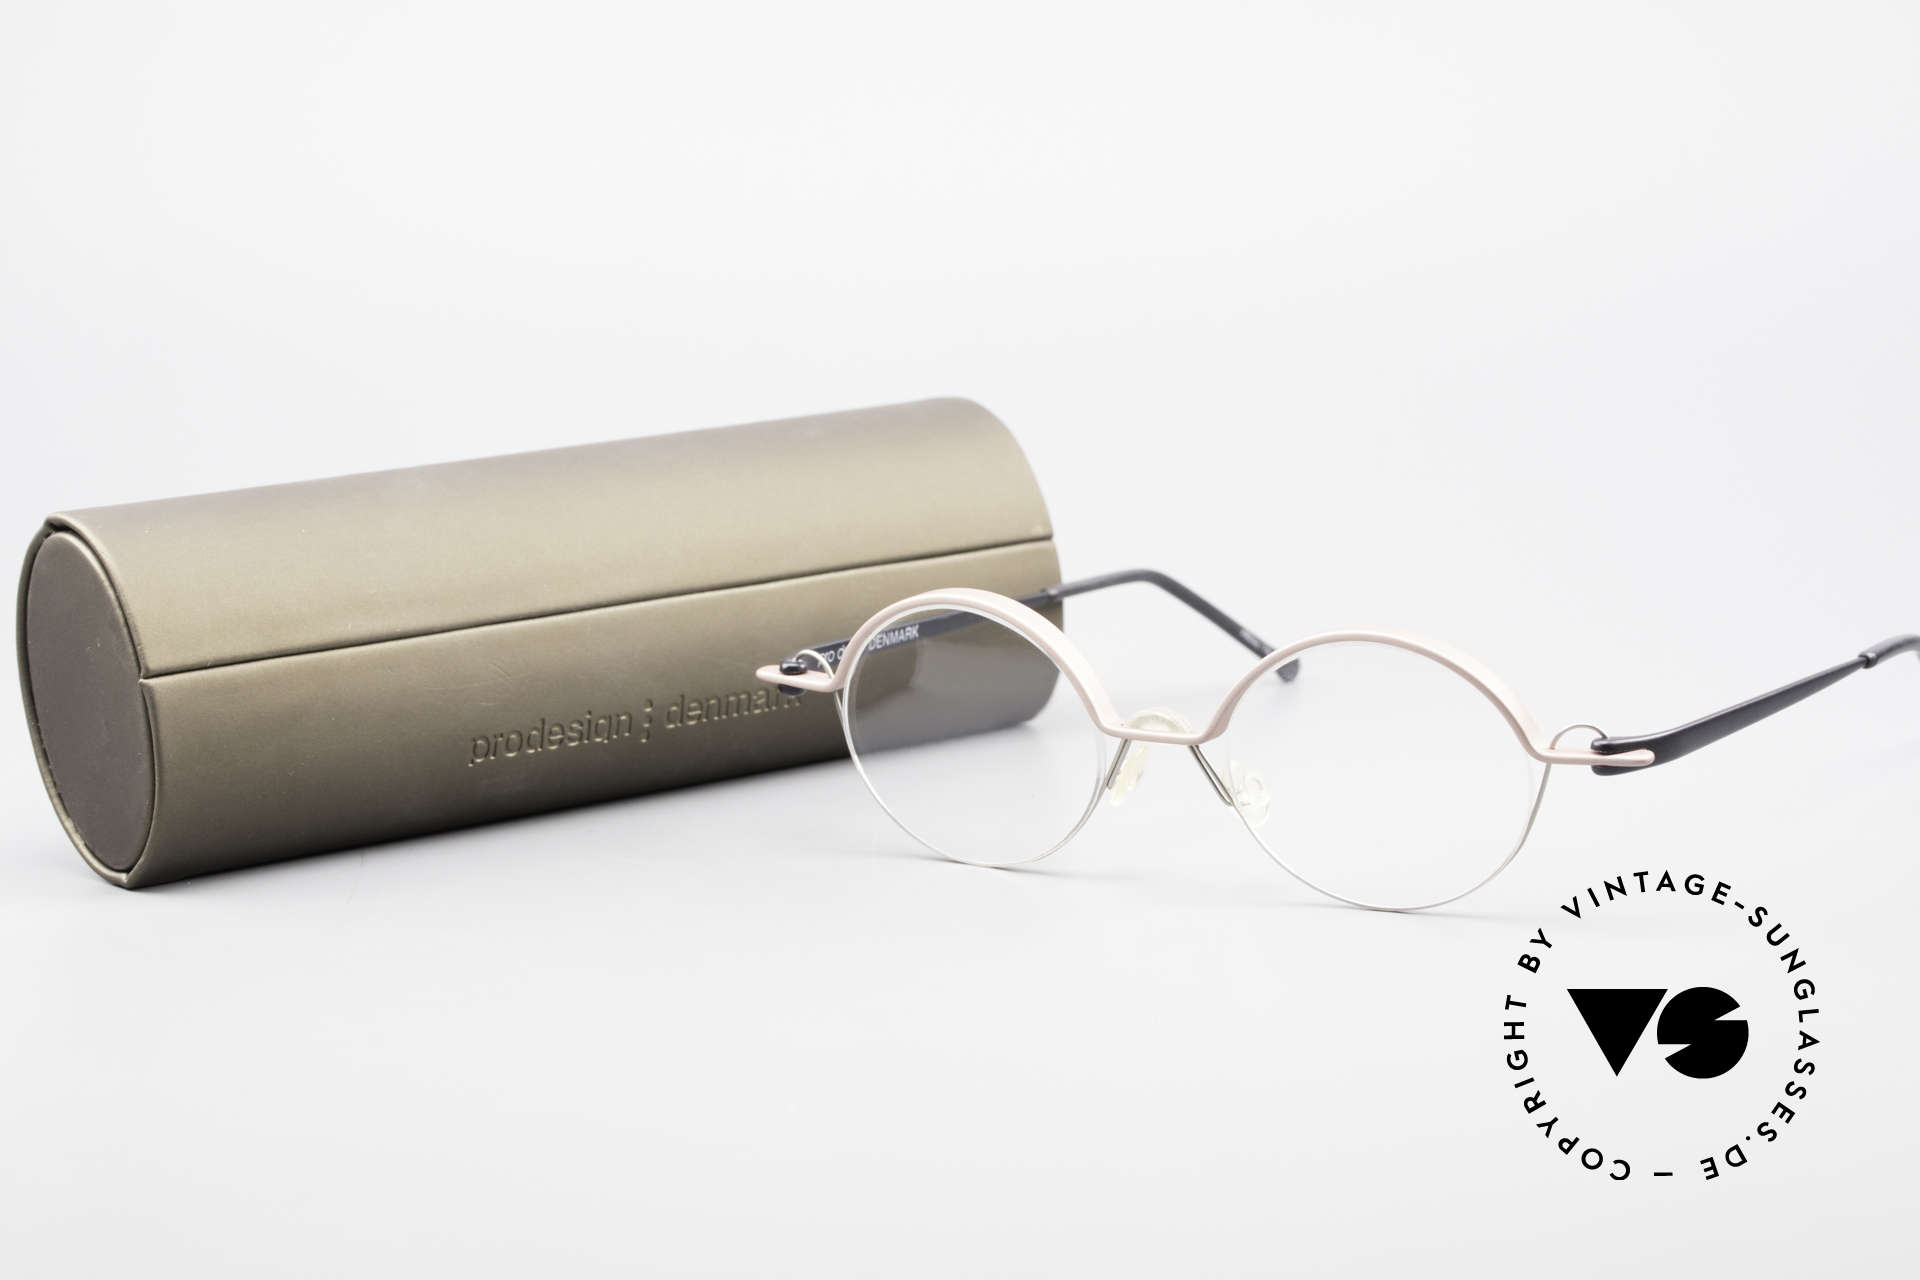 ProDesign No23 Gail Spence Design Frame 90's, Size: medium, Made for Men and Women